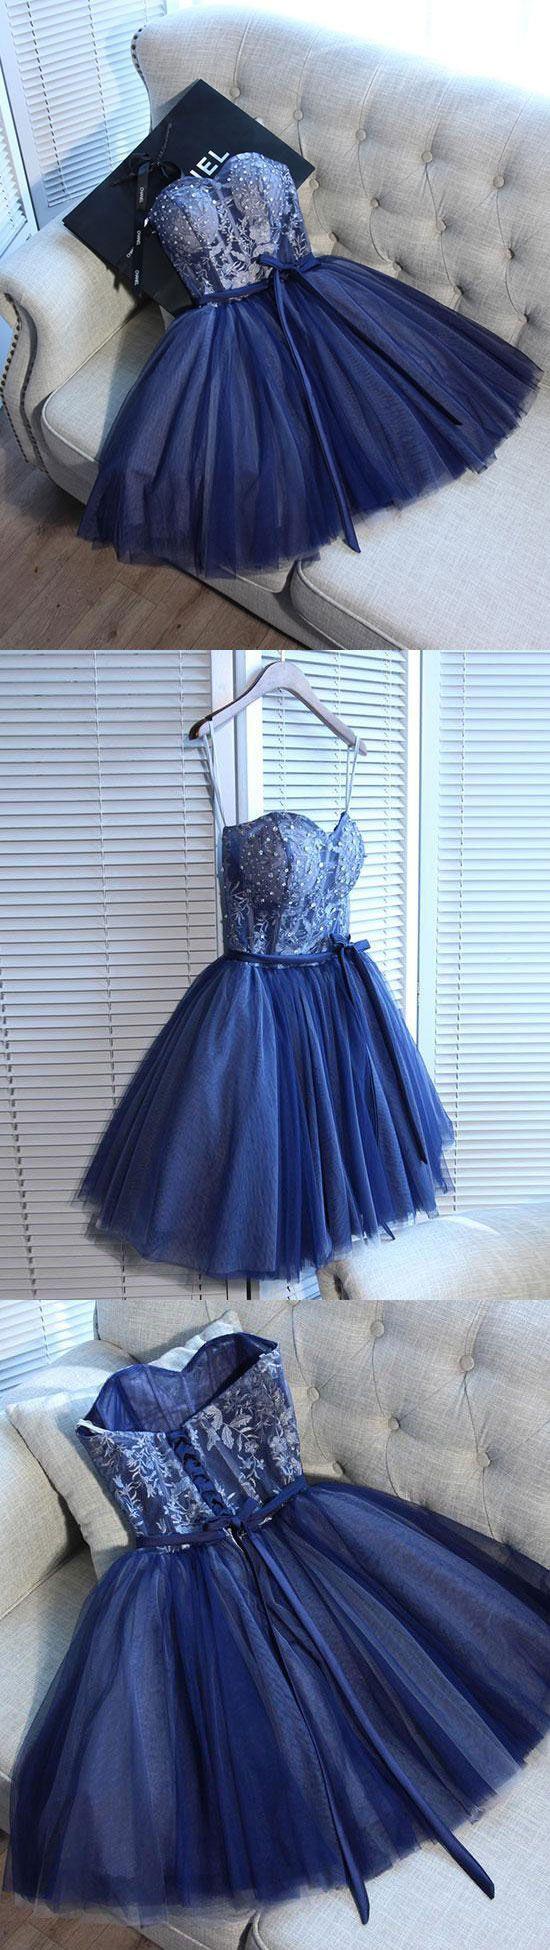 Formal Cool Dunkelblaues Kurzes Kleid Boutique13 Erstaunlich Dunkelblaues Kurzes Kleid Galerie